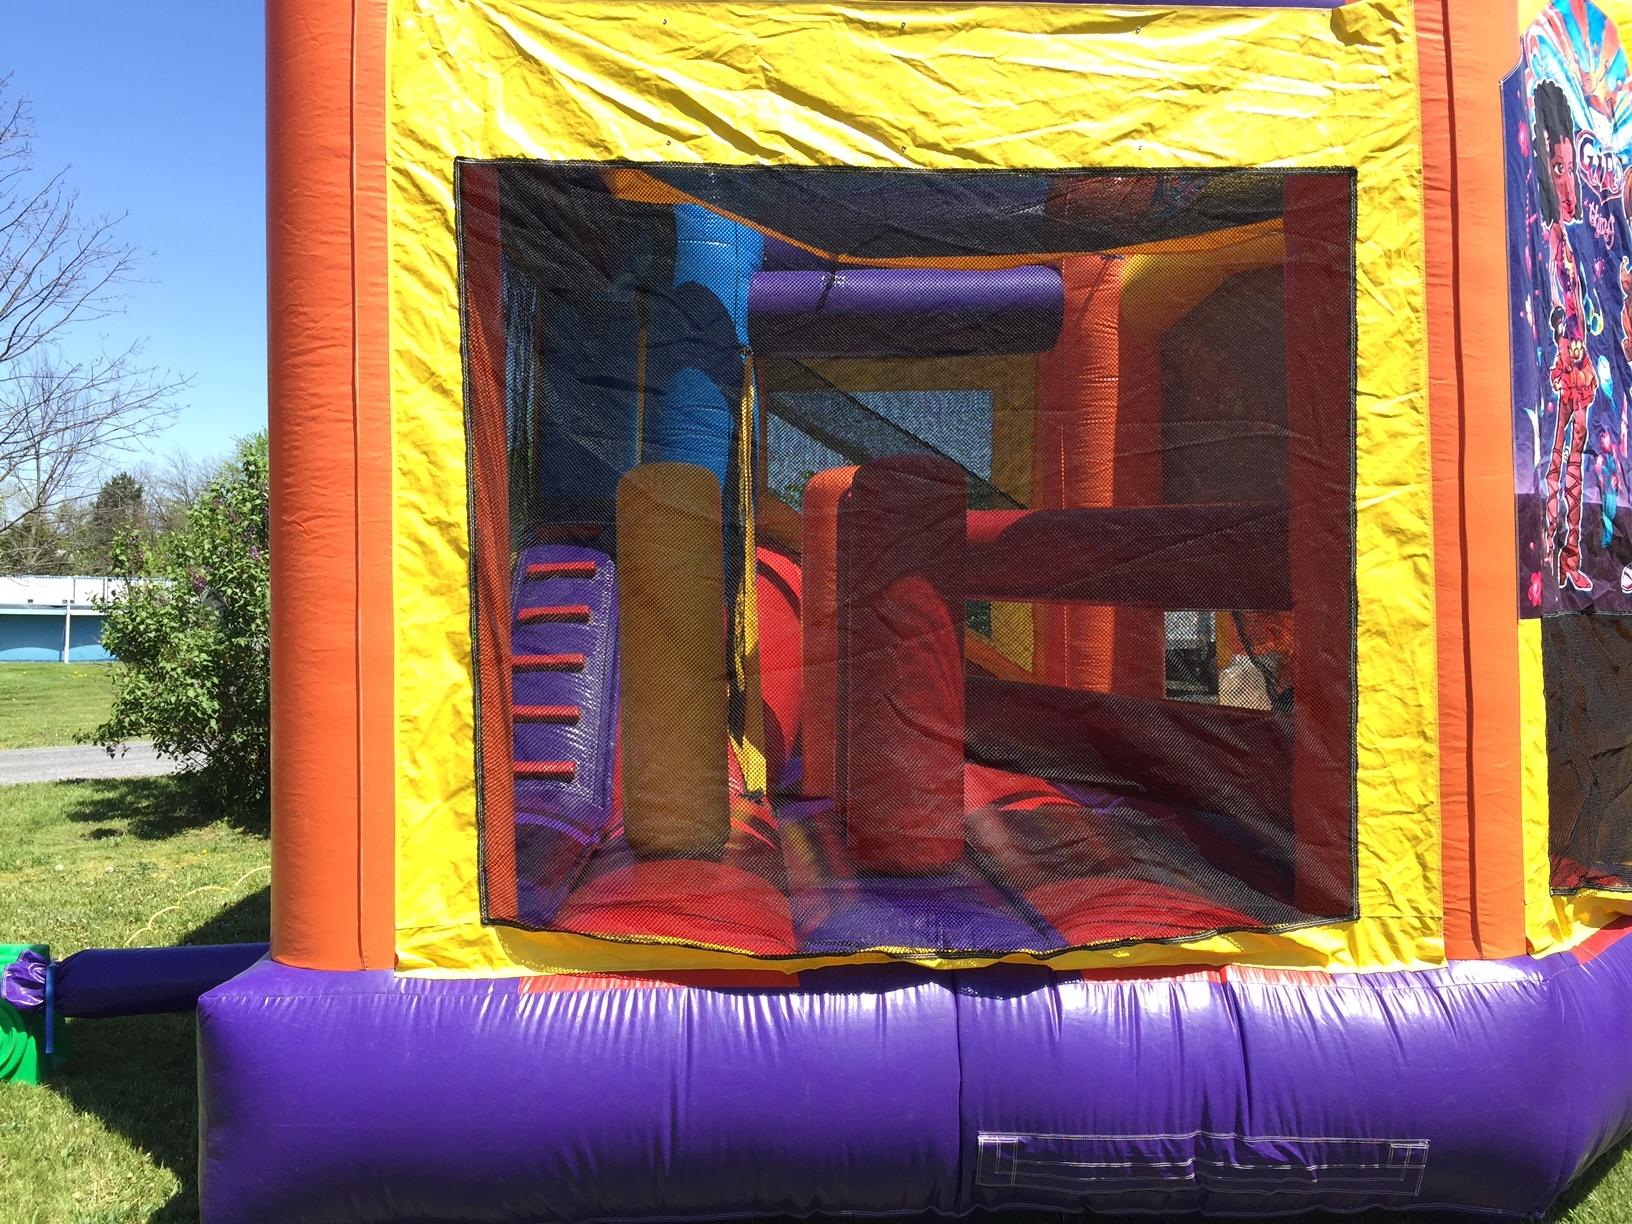 Incredible Inflatables LLC image 6